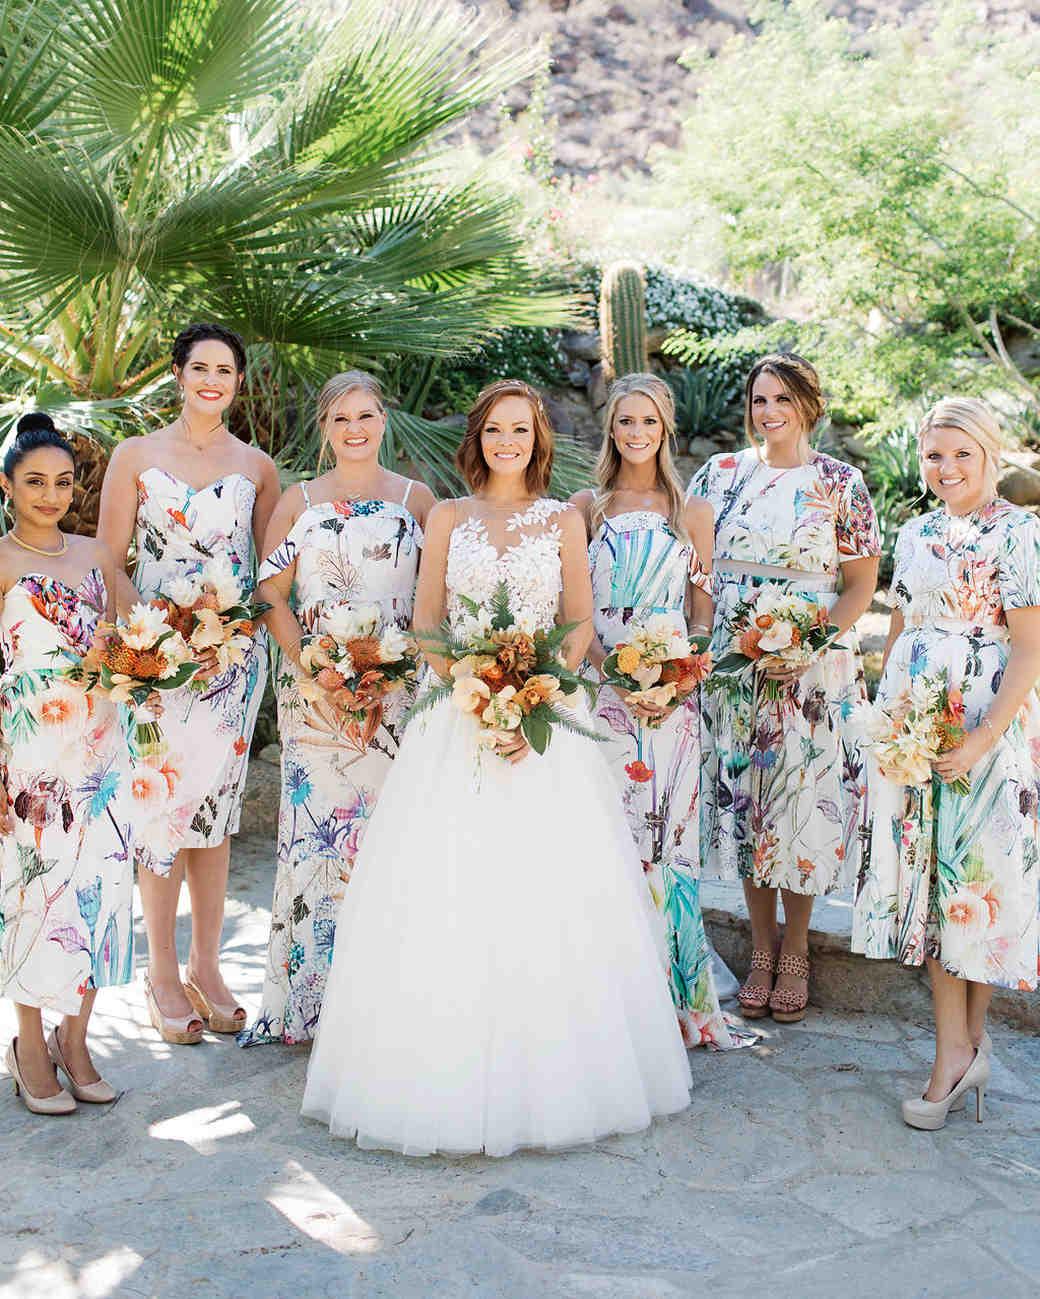 emily adhir wedding bridesmaids